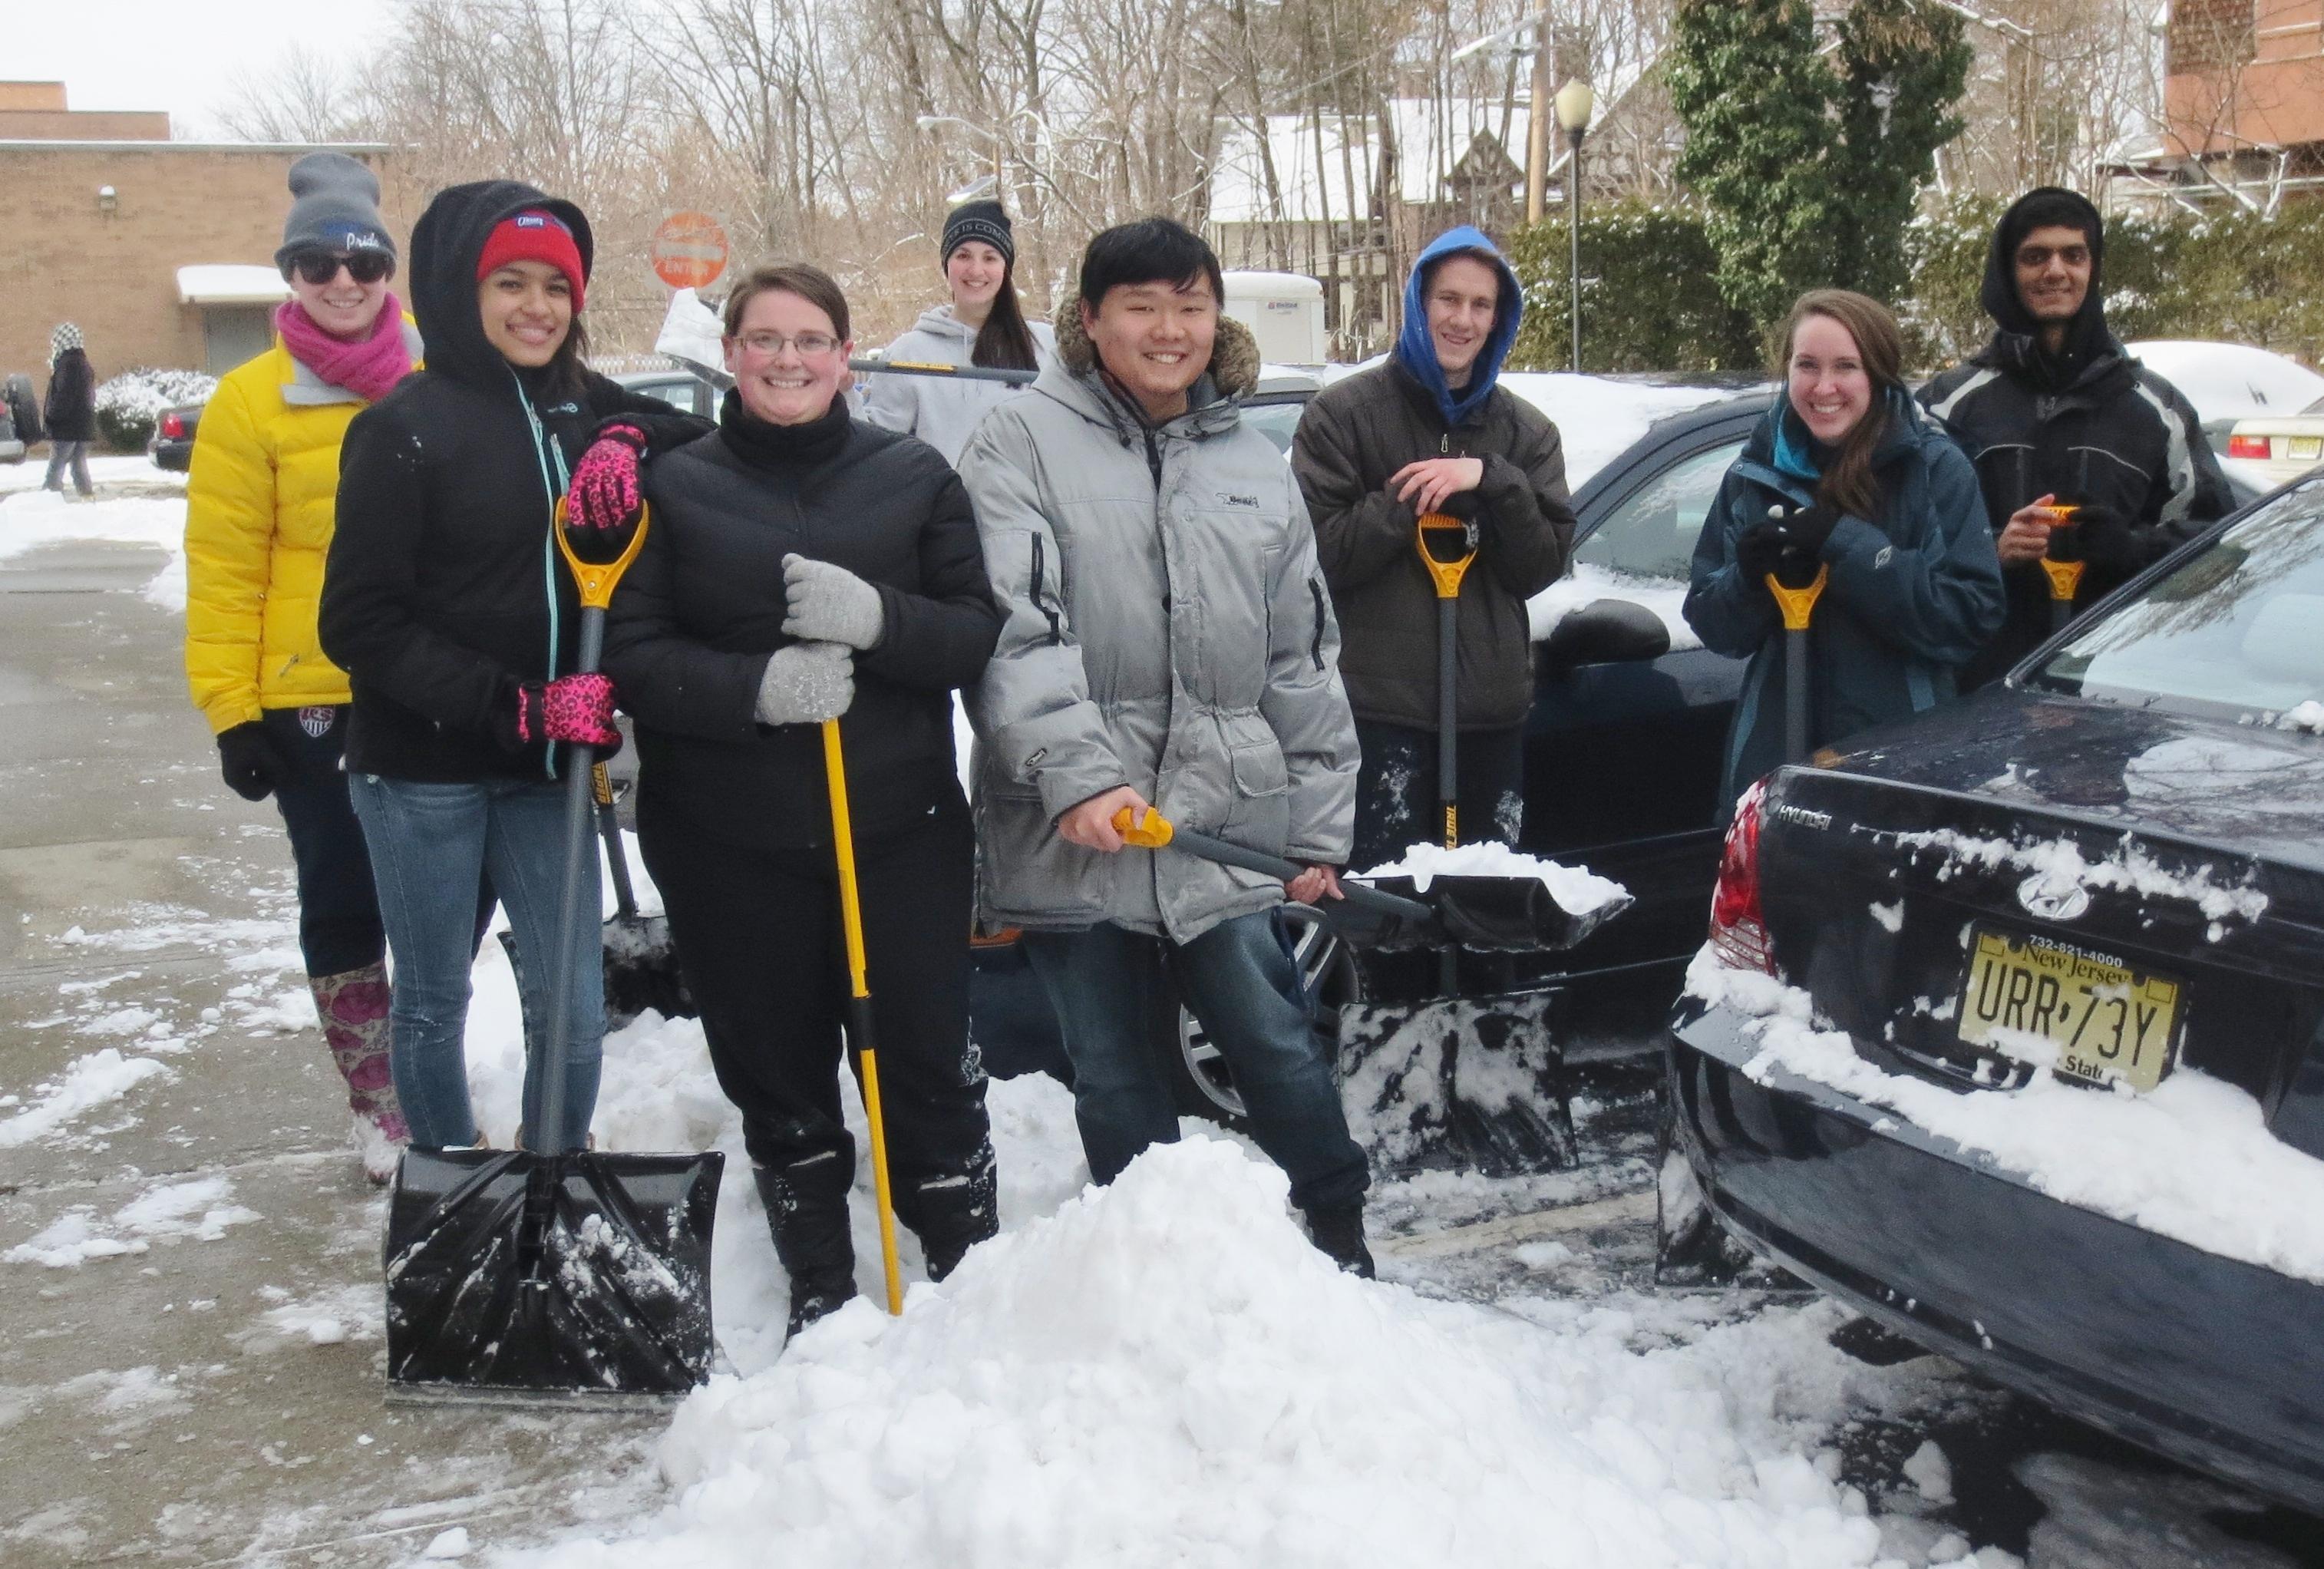 72dde8eecc1c605f9f5b_Seton_Hall_snow_shovelers.JPG